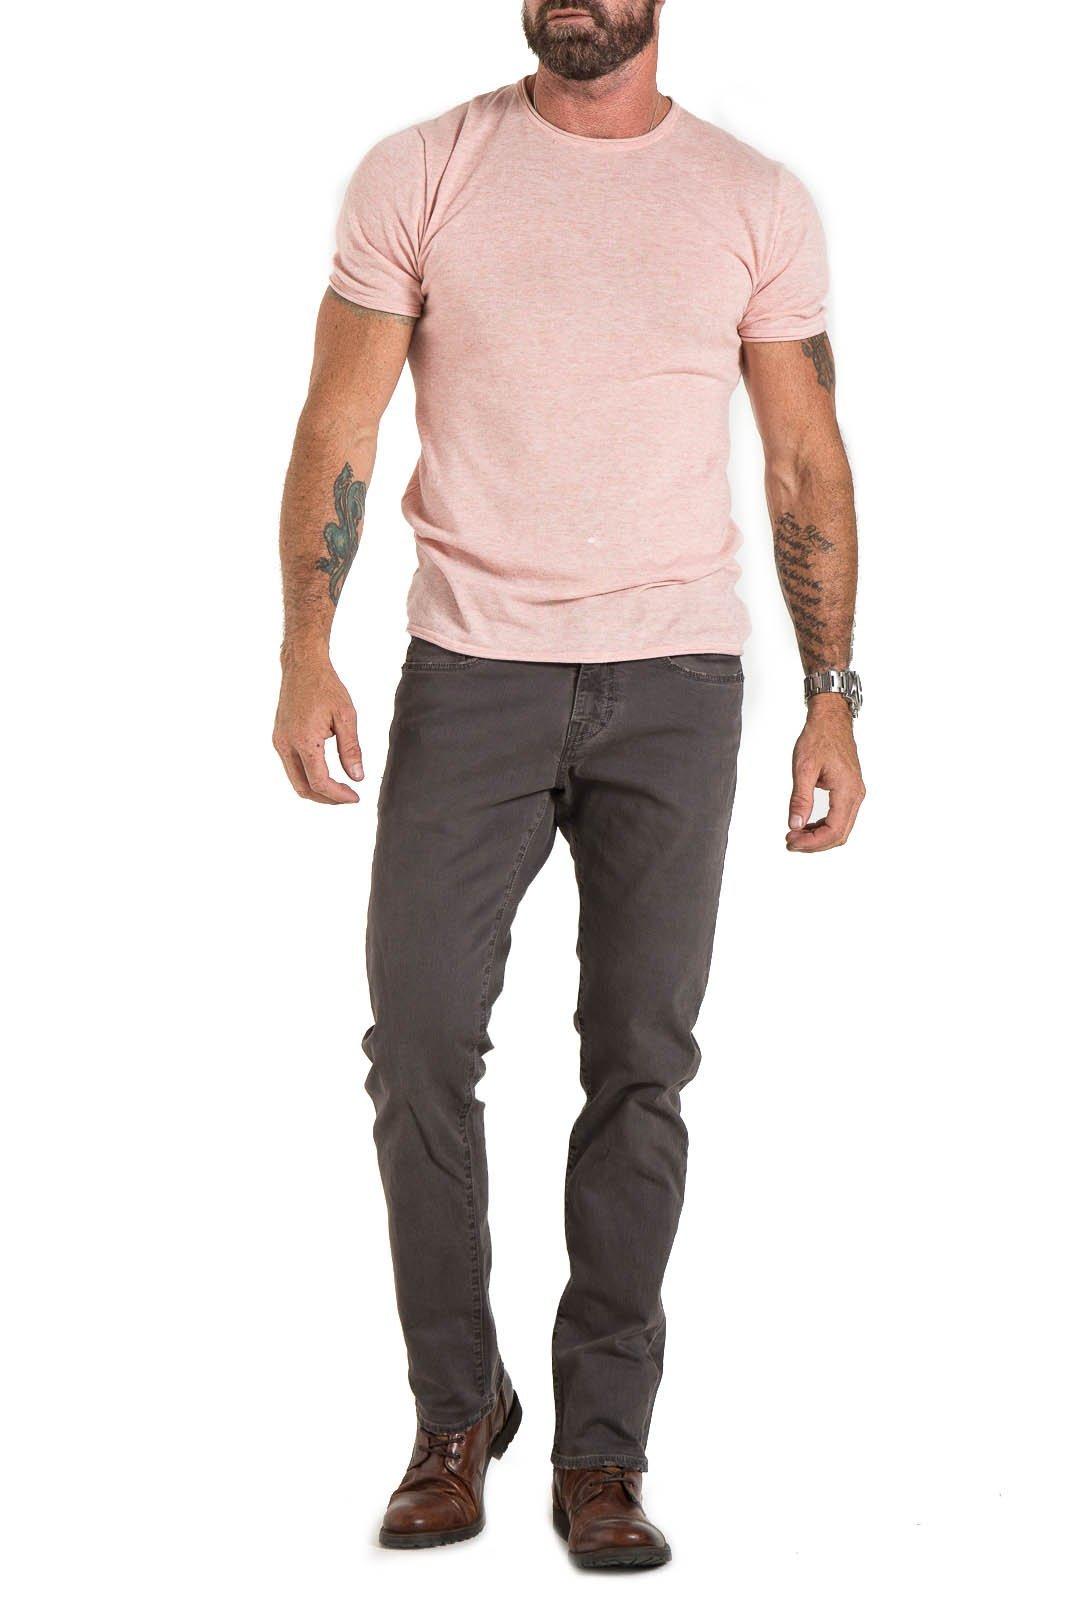 Stitch's Jeans Men's Barfly Slim Vintage Twill Jean